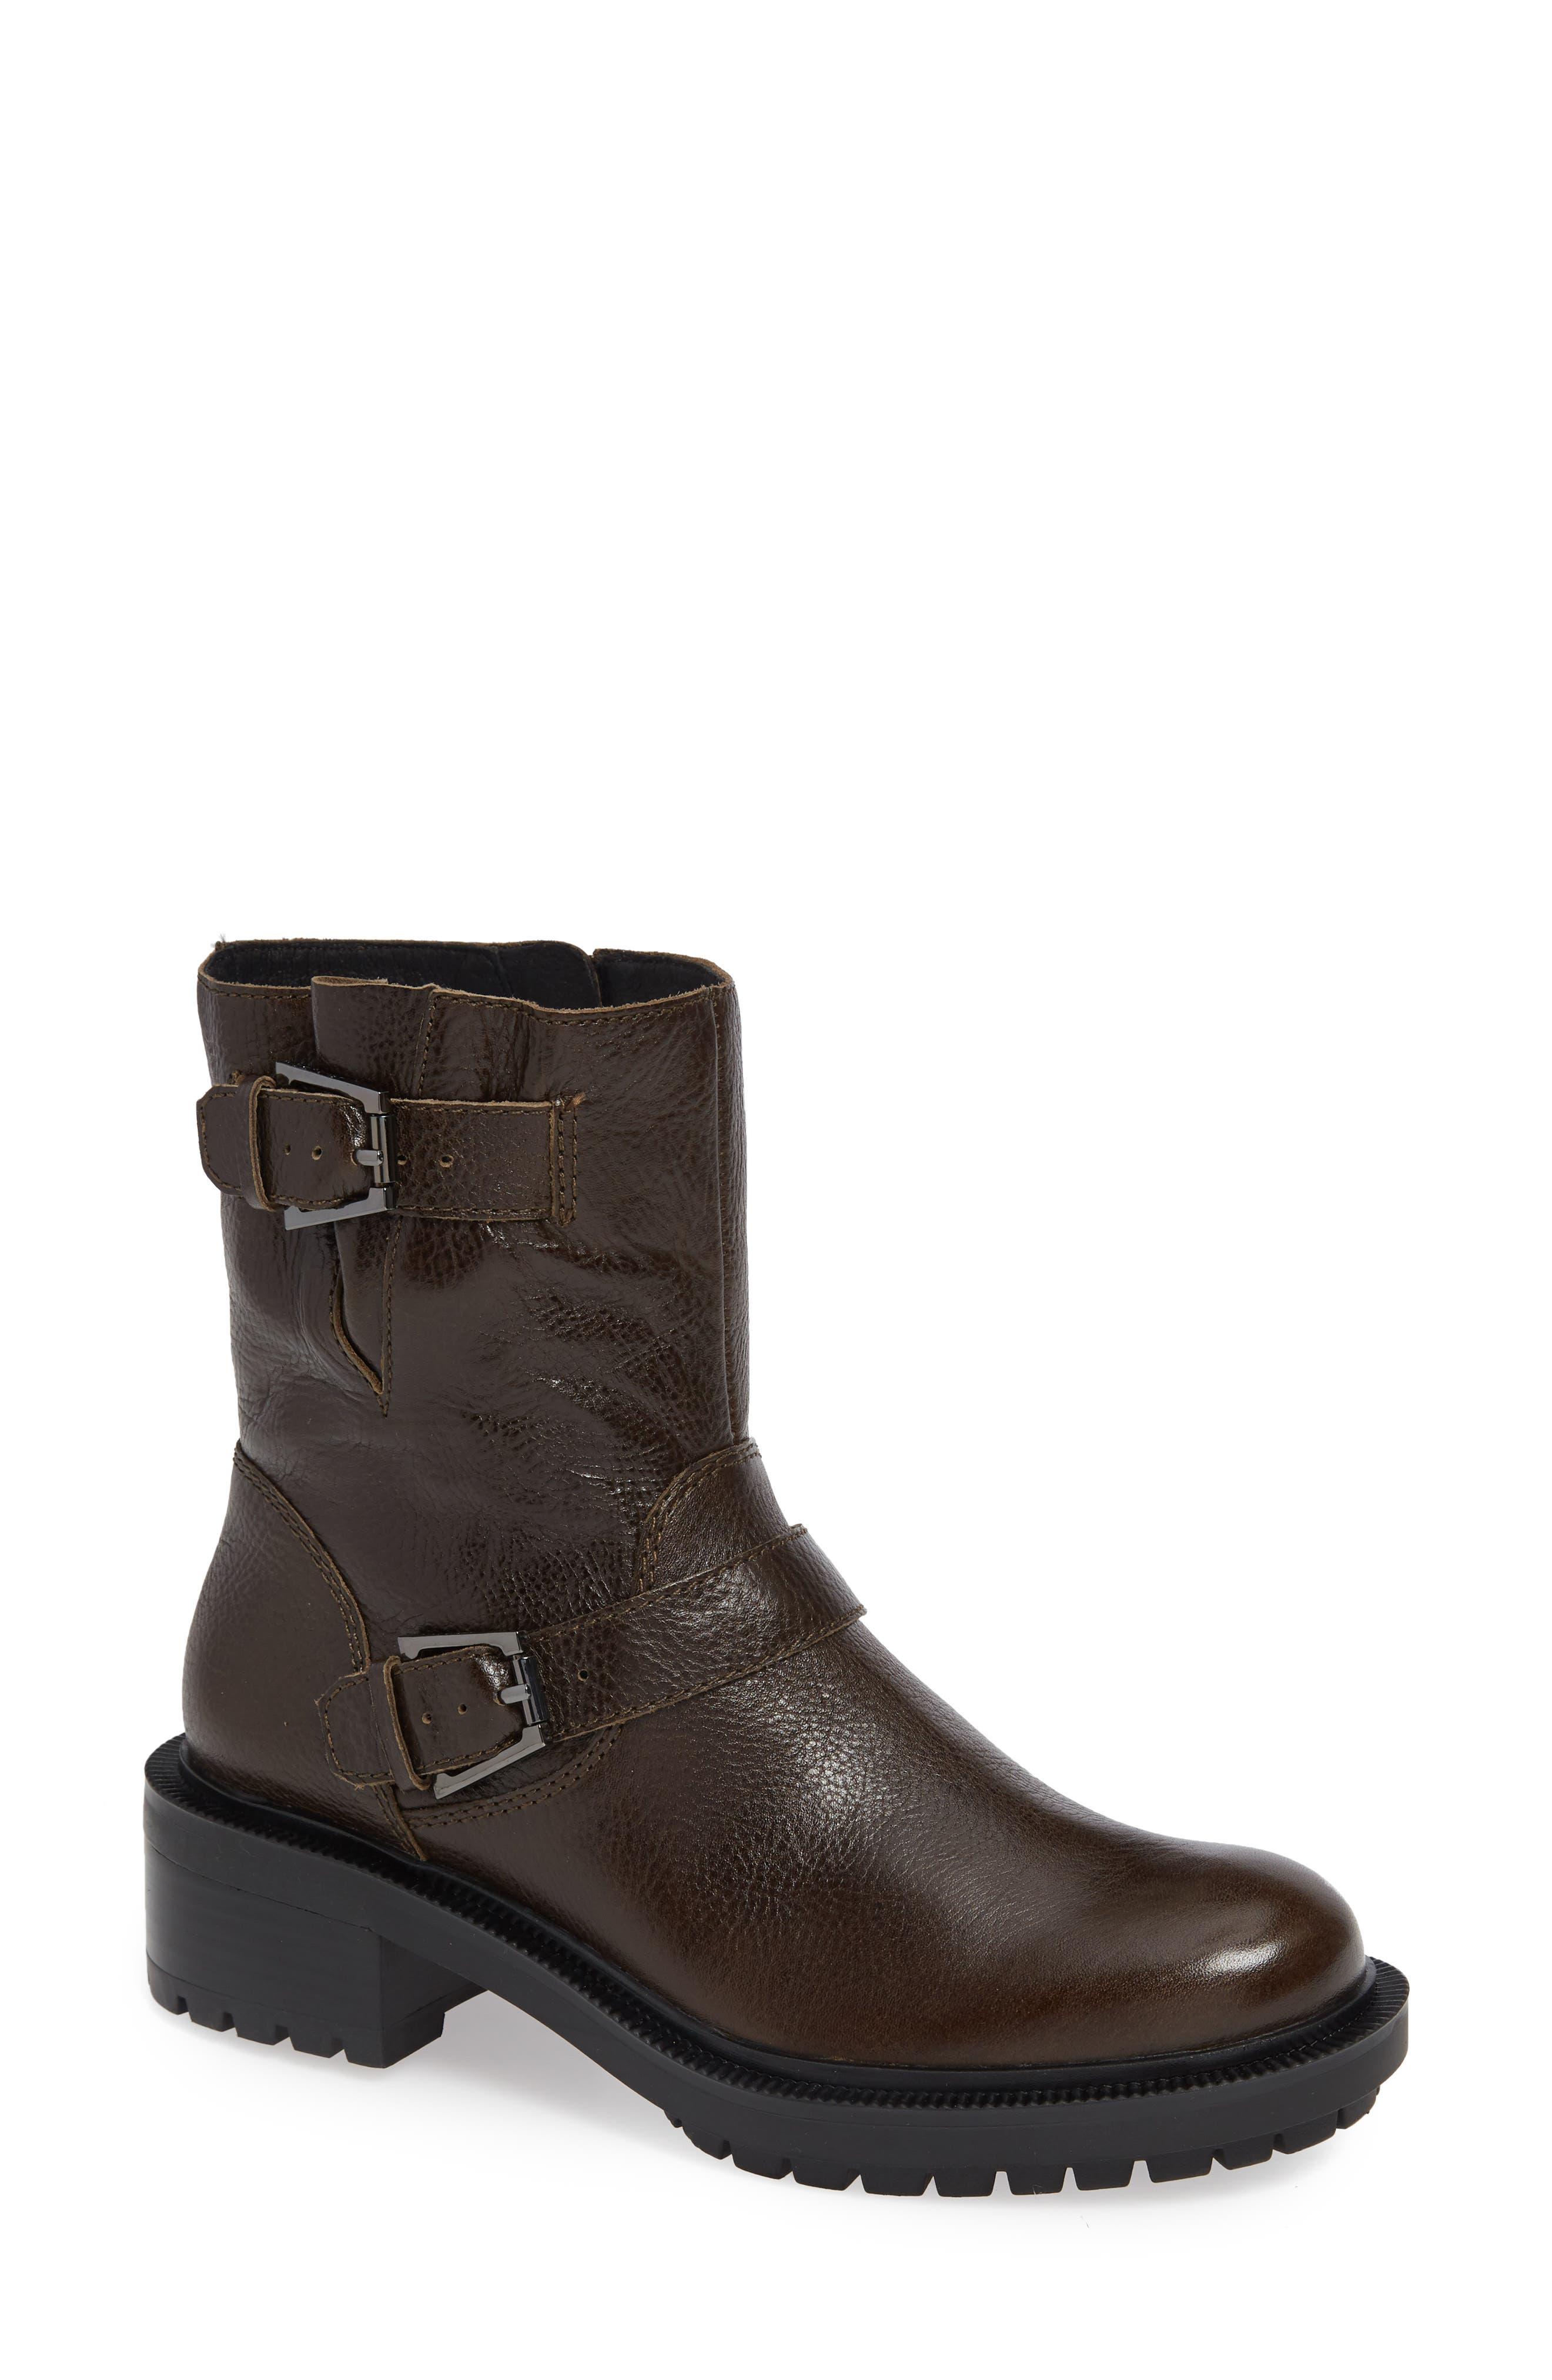 Women S Botkier Boots Nordstrom